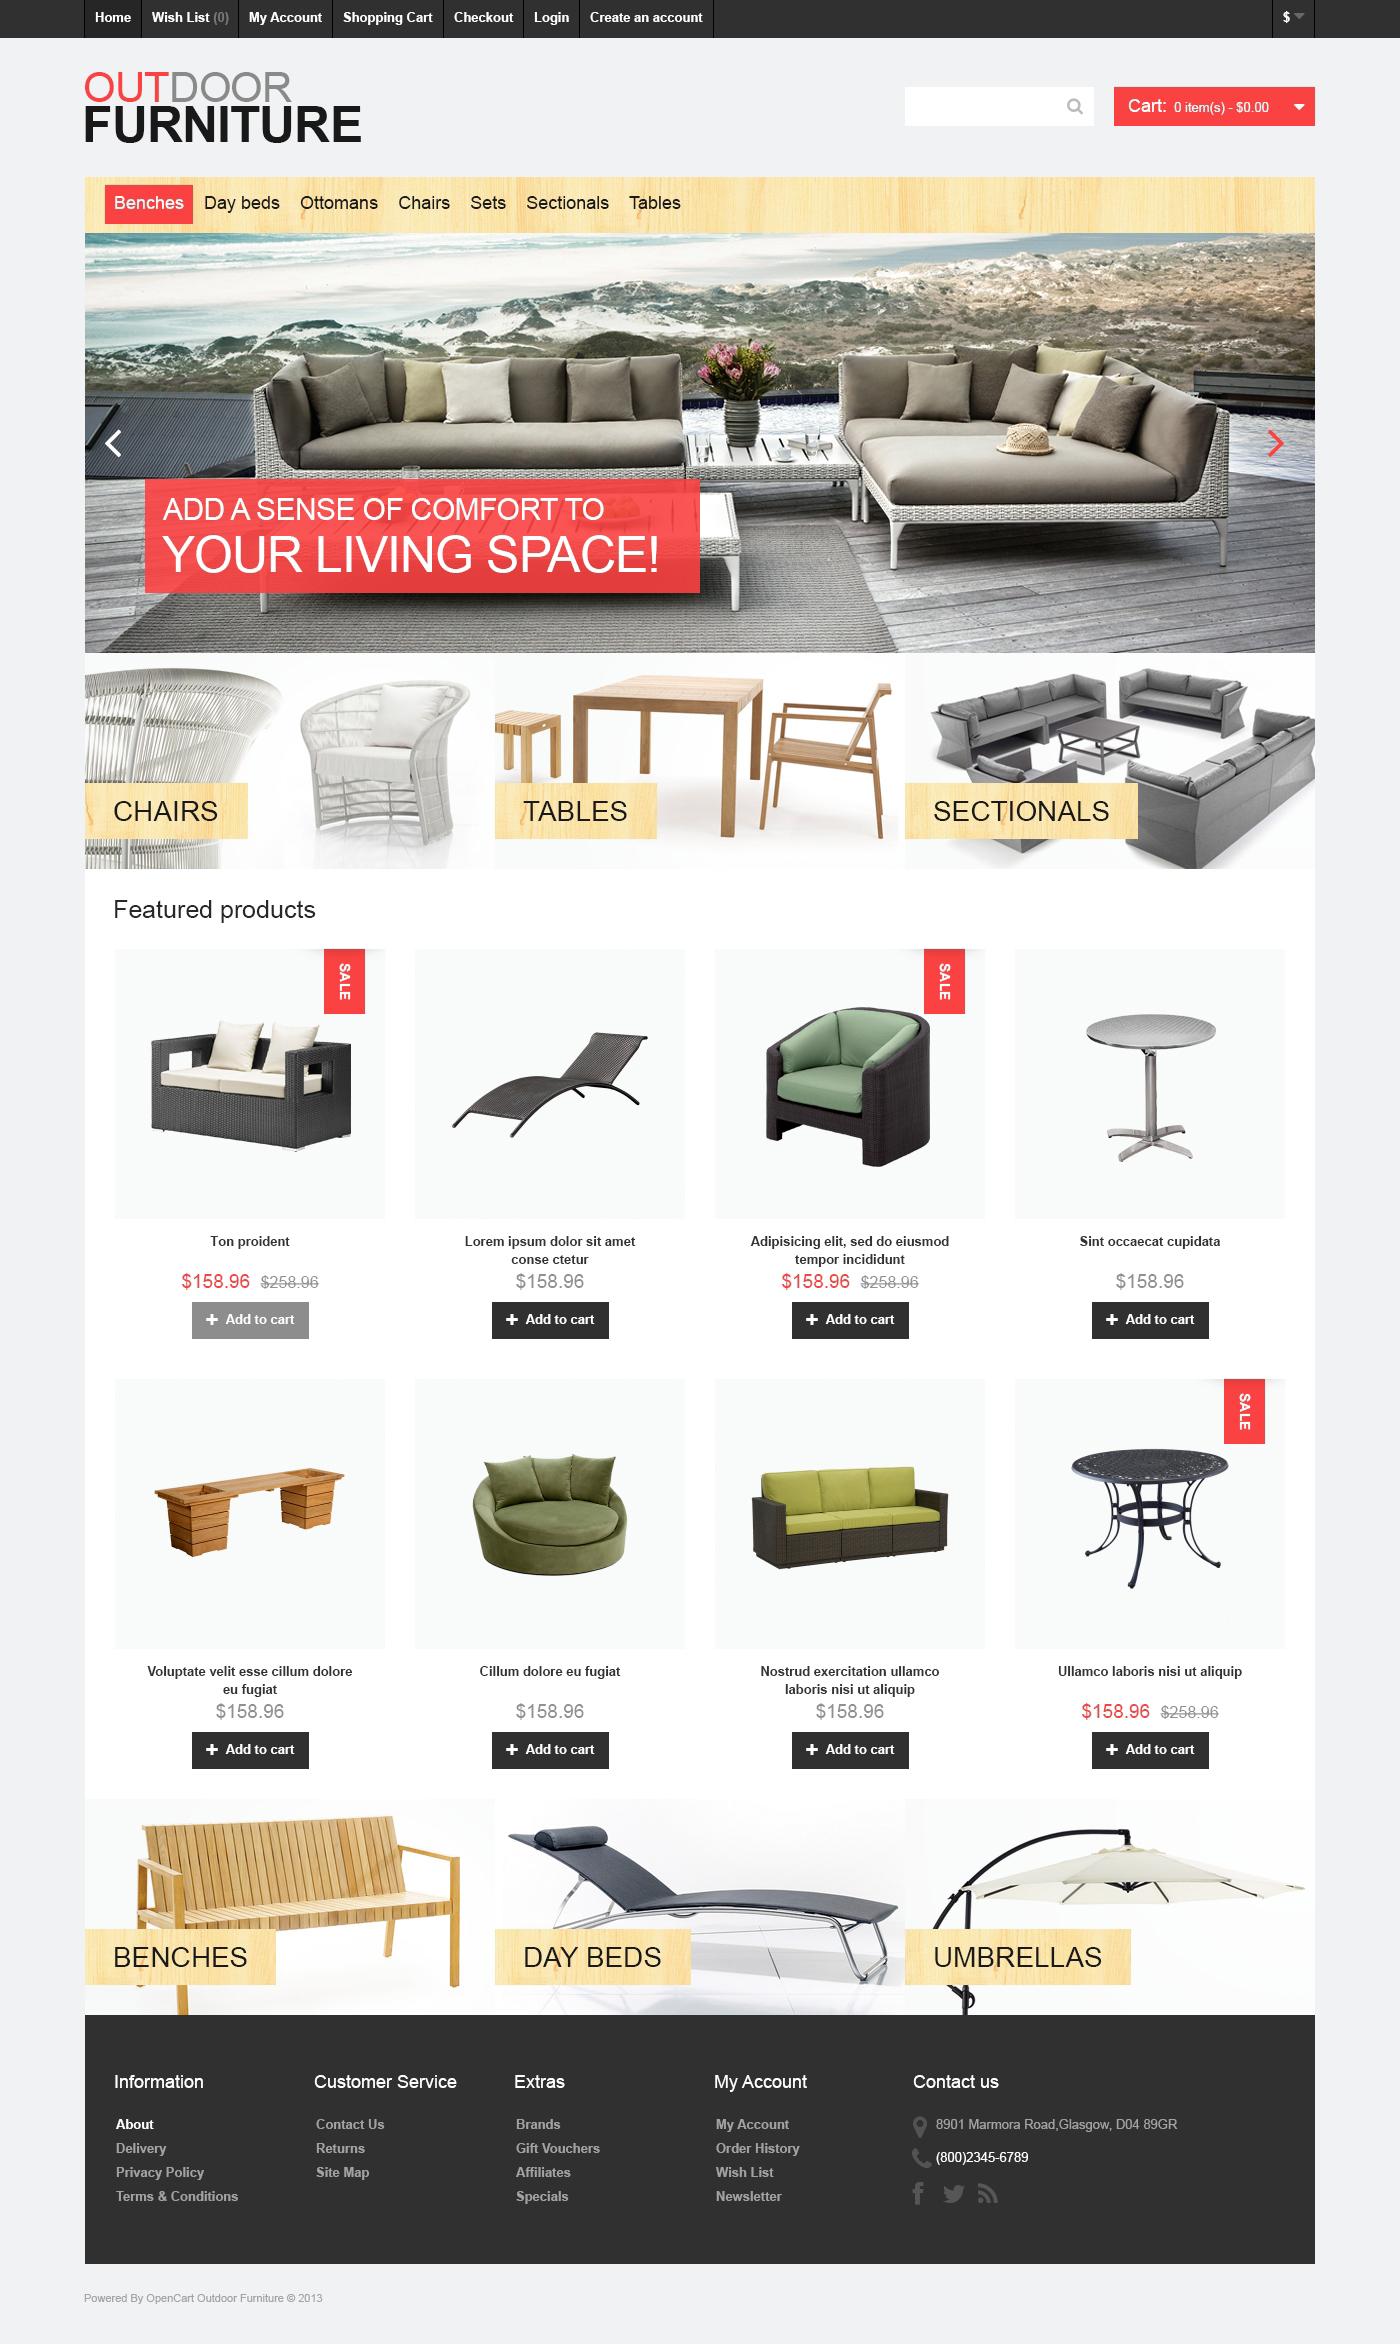 Outdoor Furniture OpenCart Template